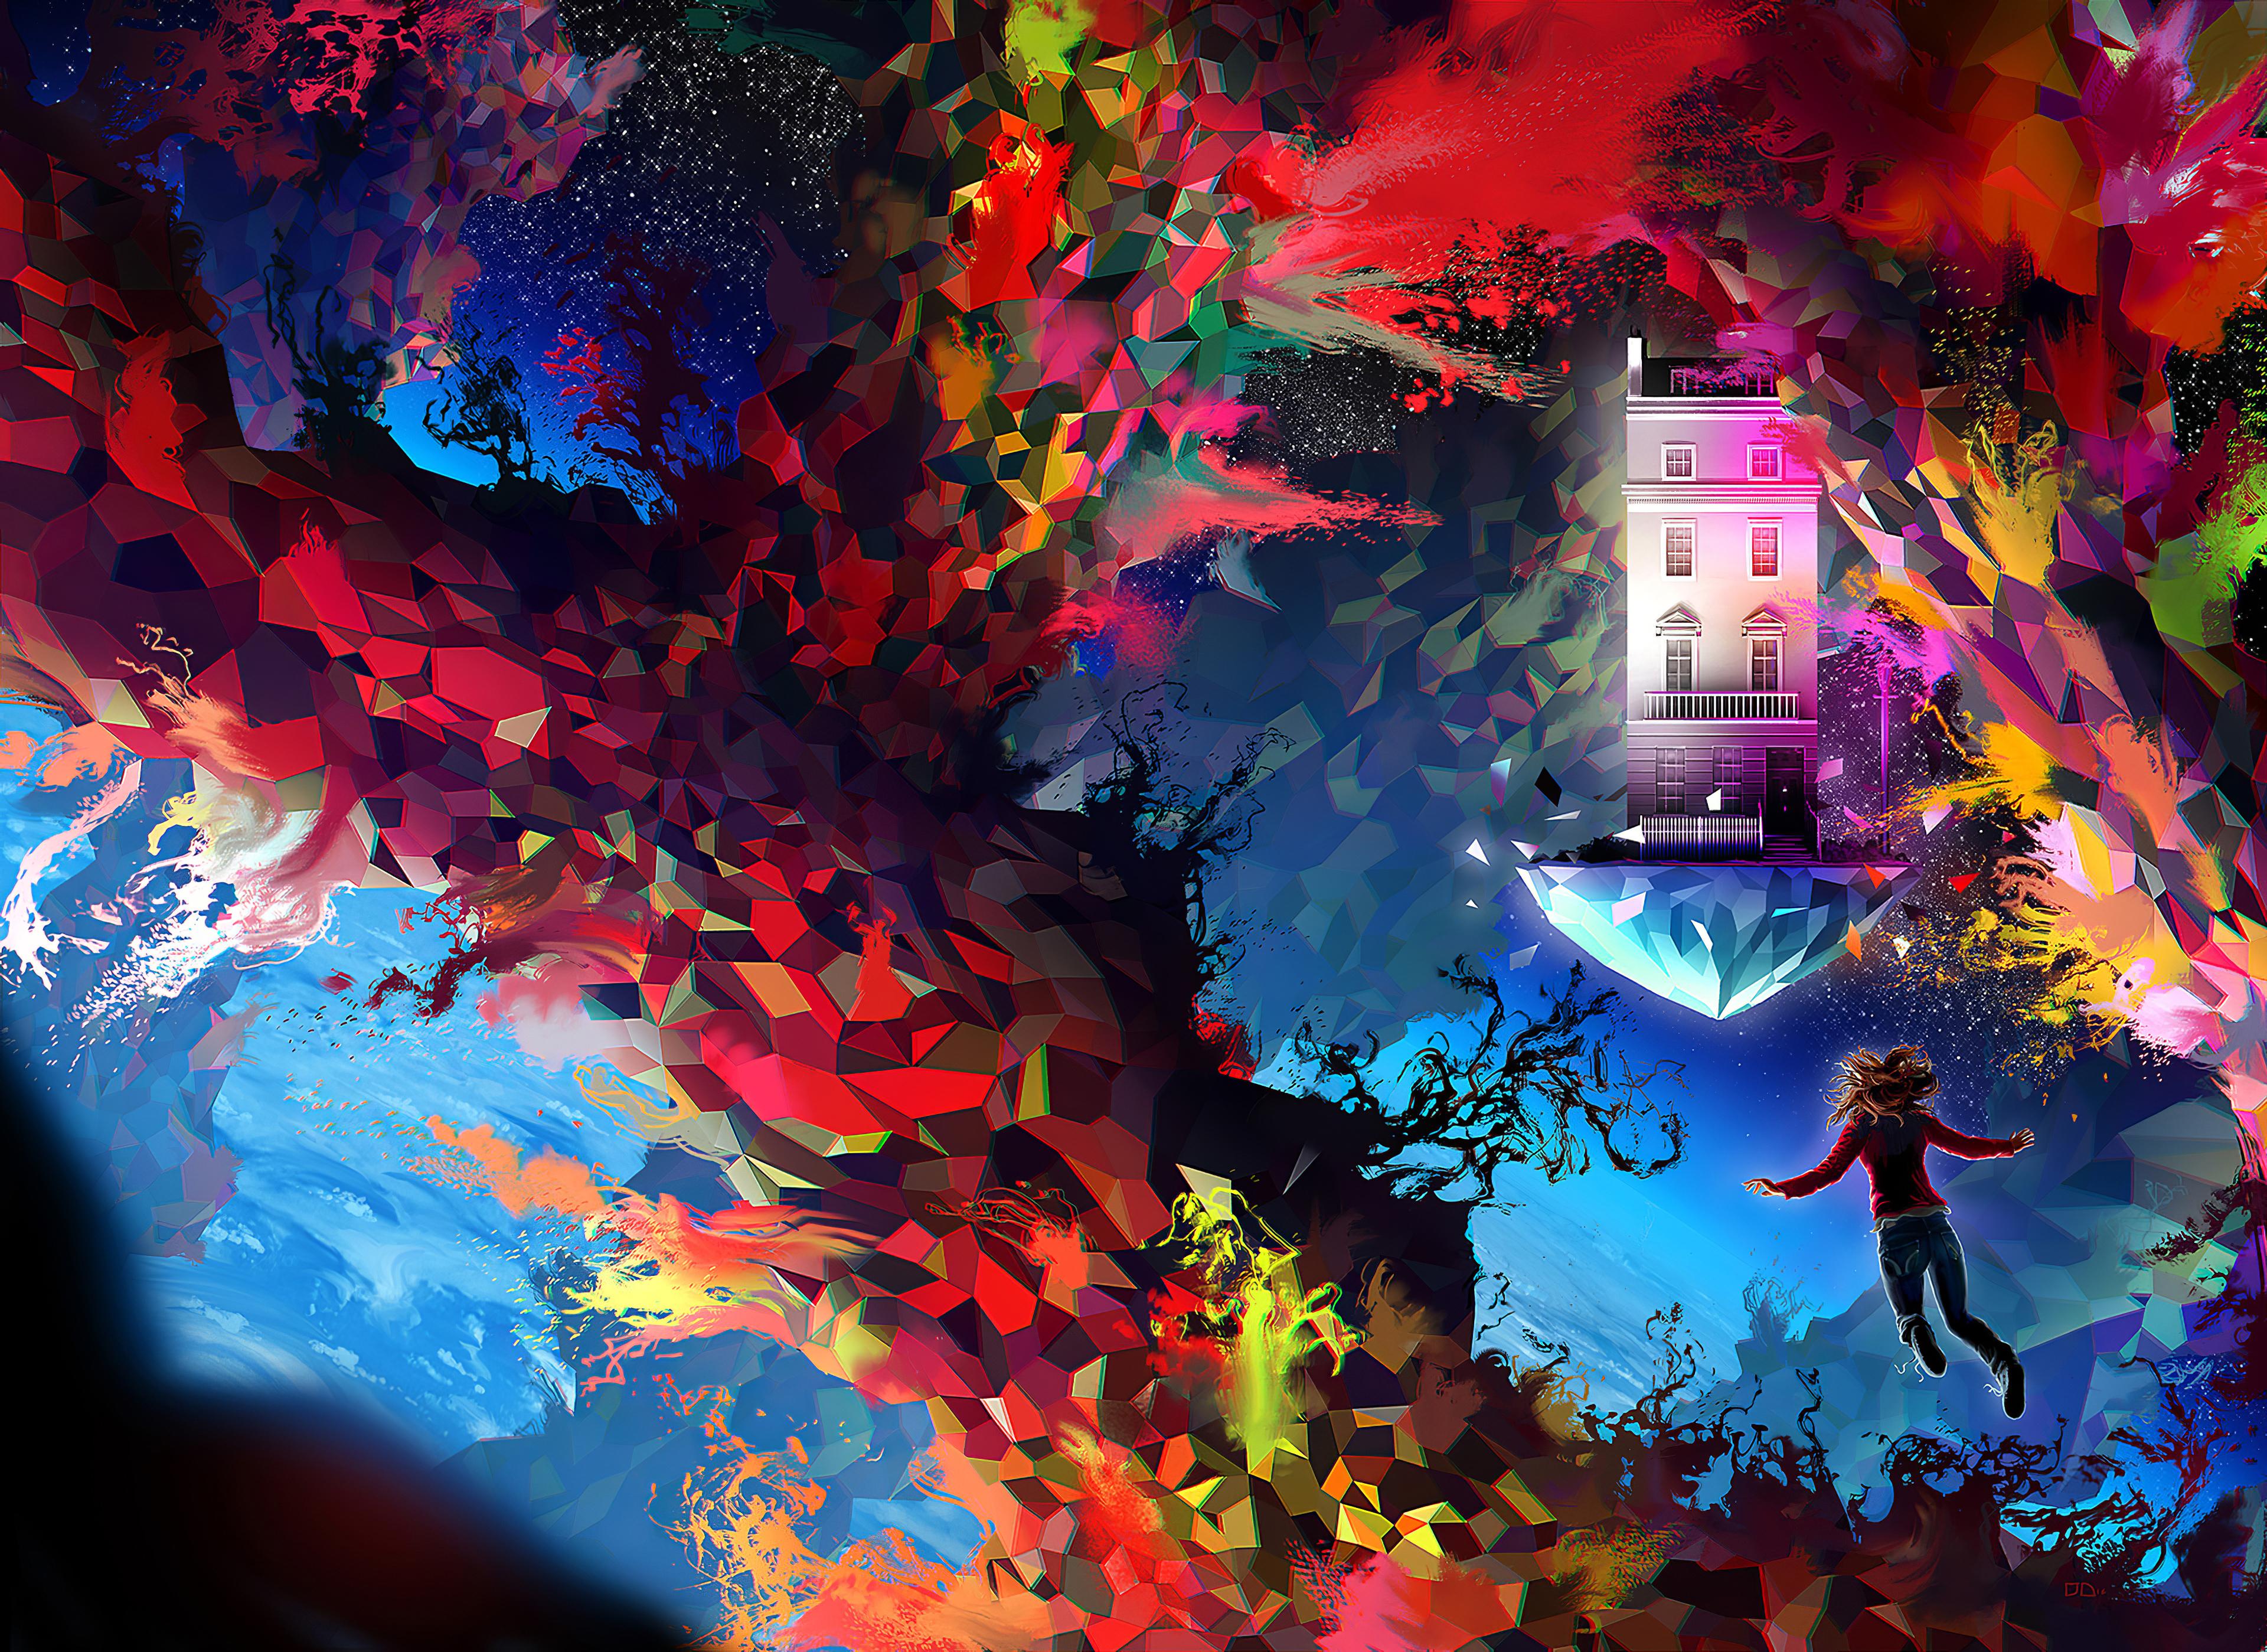 colorful date magical 1574941033 - Colorful Date Magical -